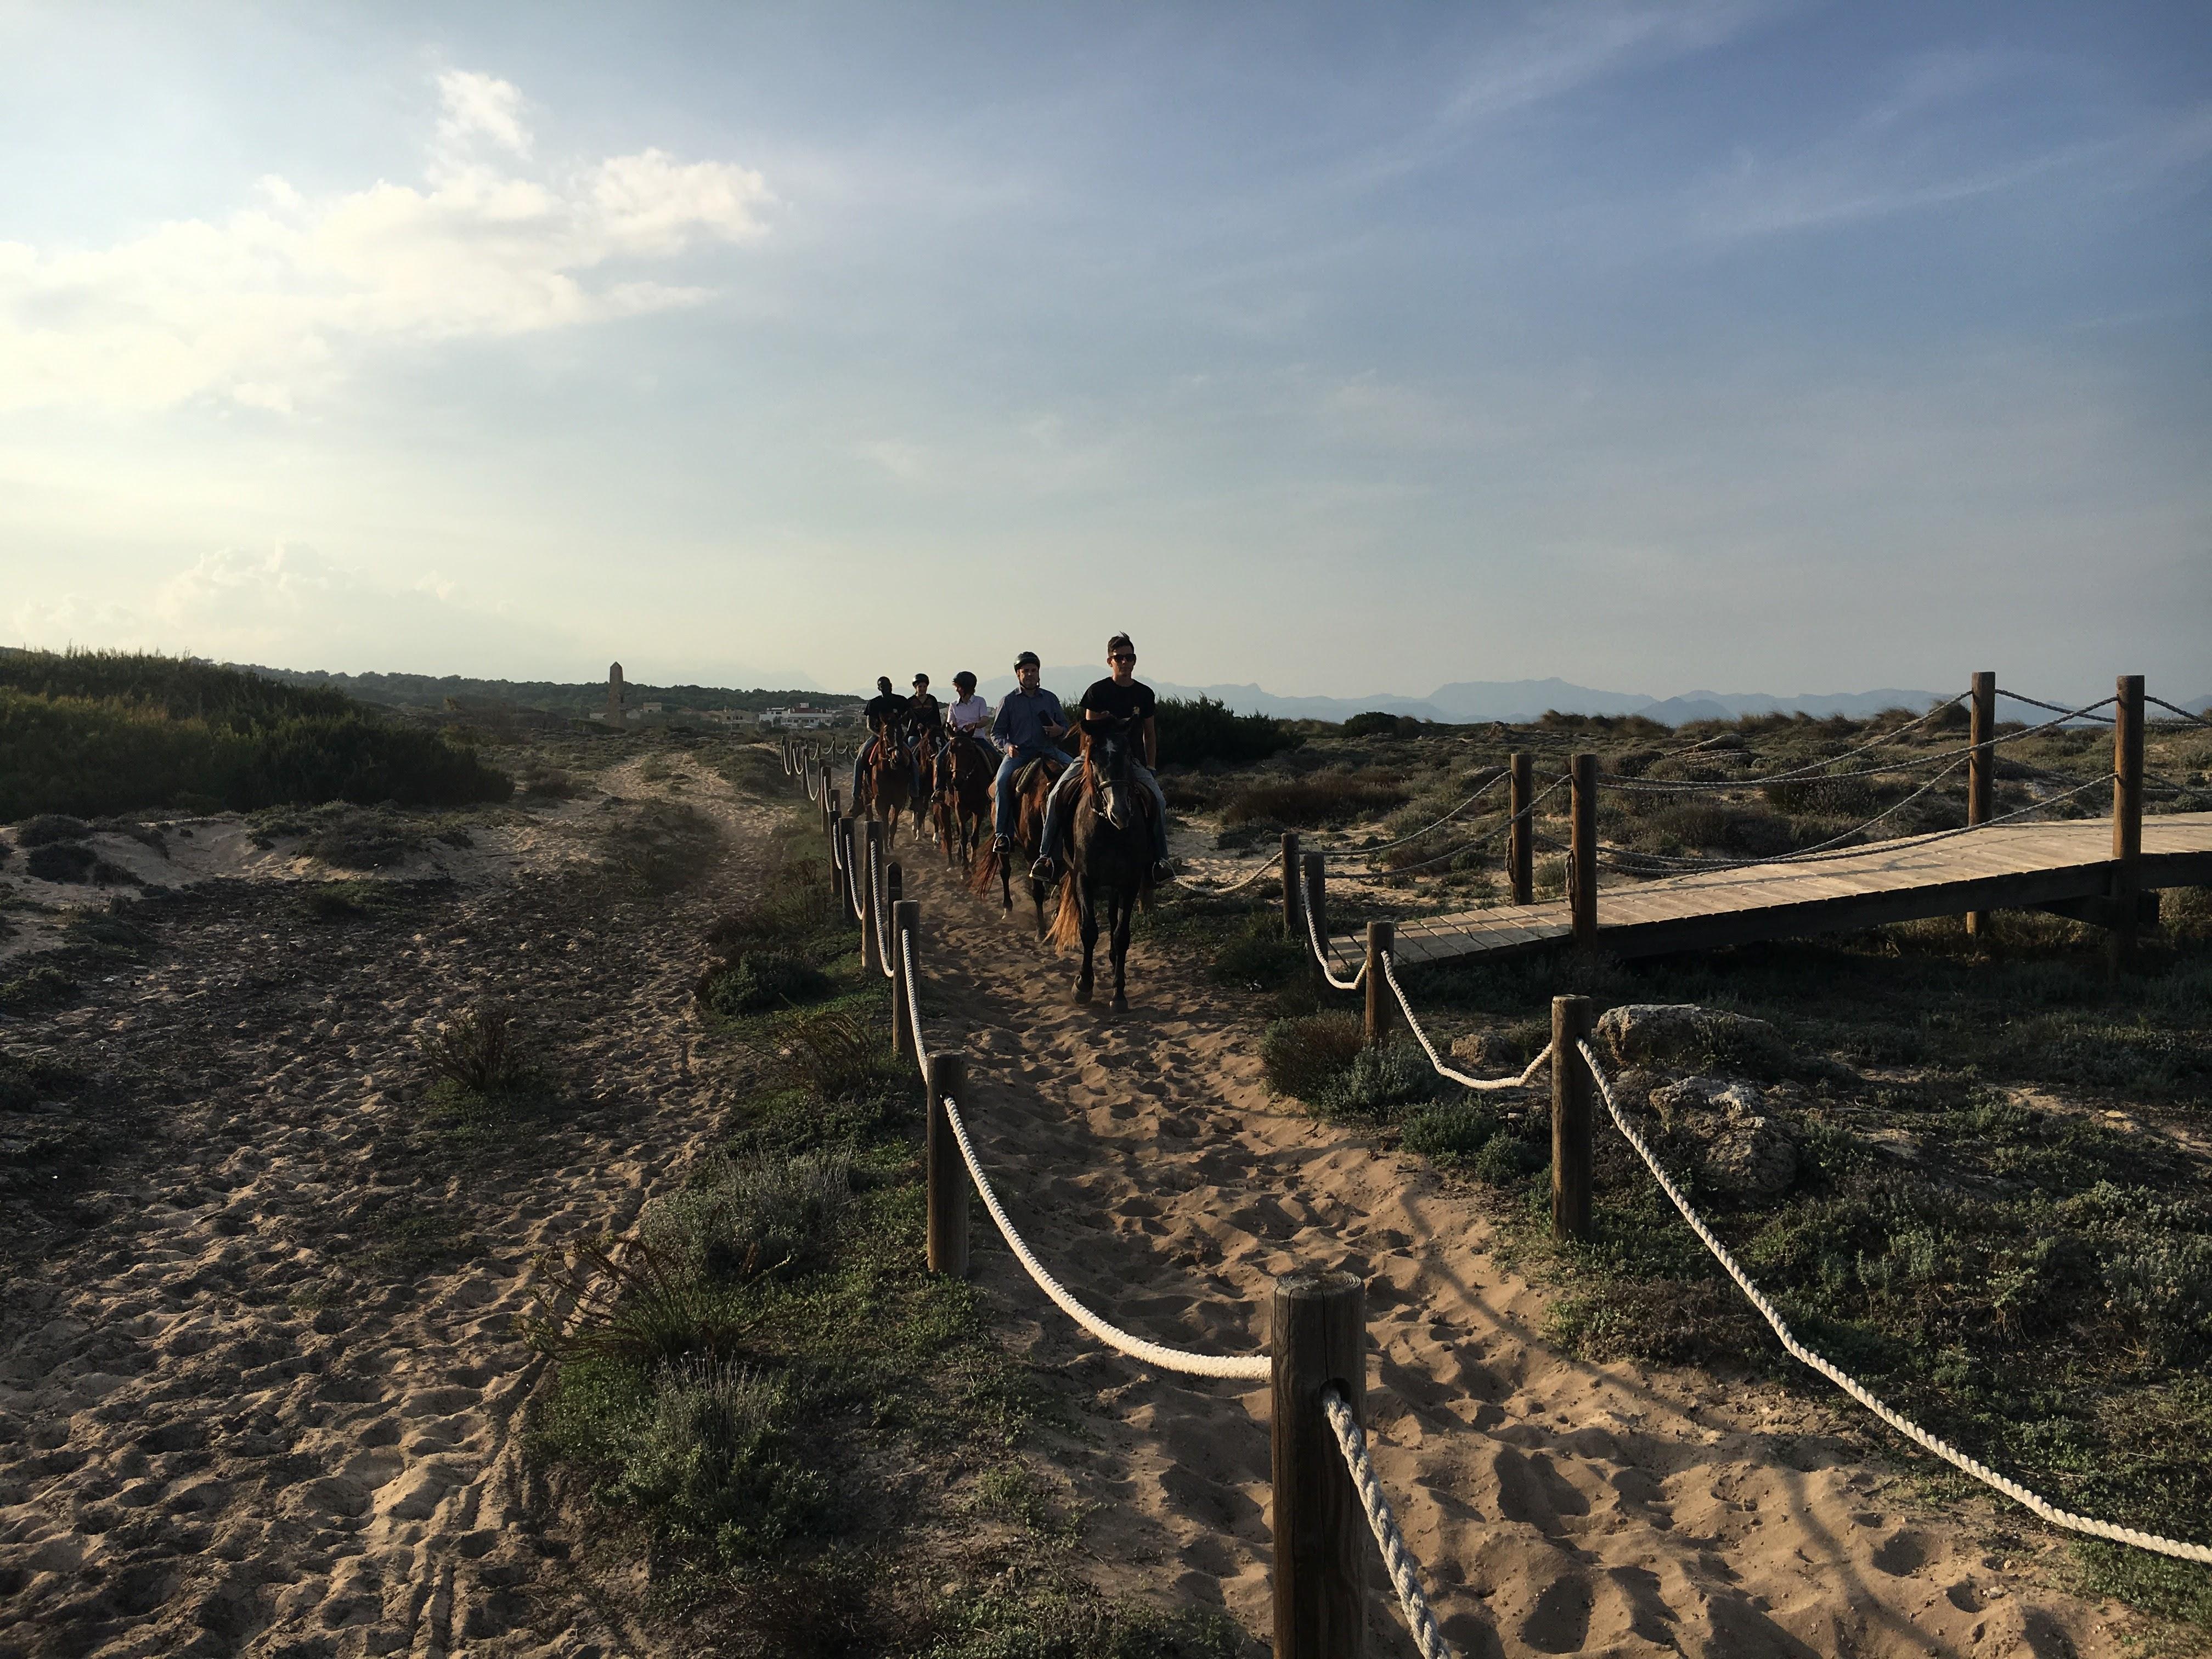 sacanova_excursio_organitzada_cavalls_corredorinterdunar2